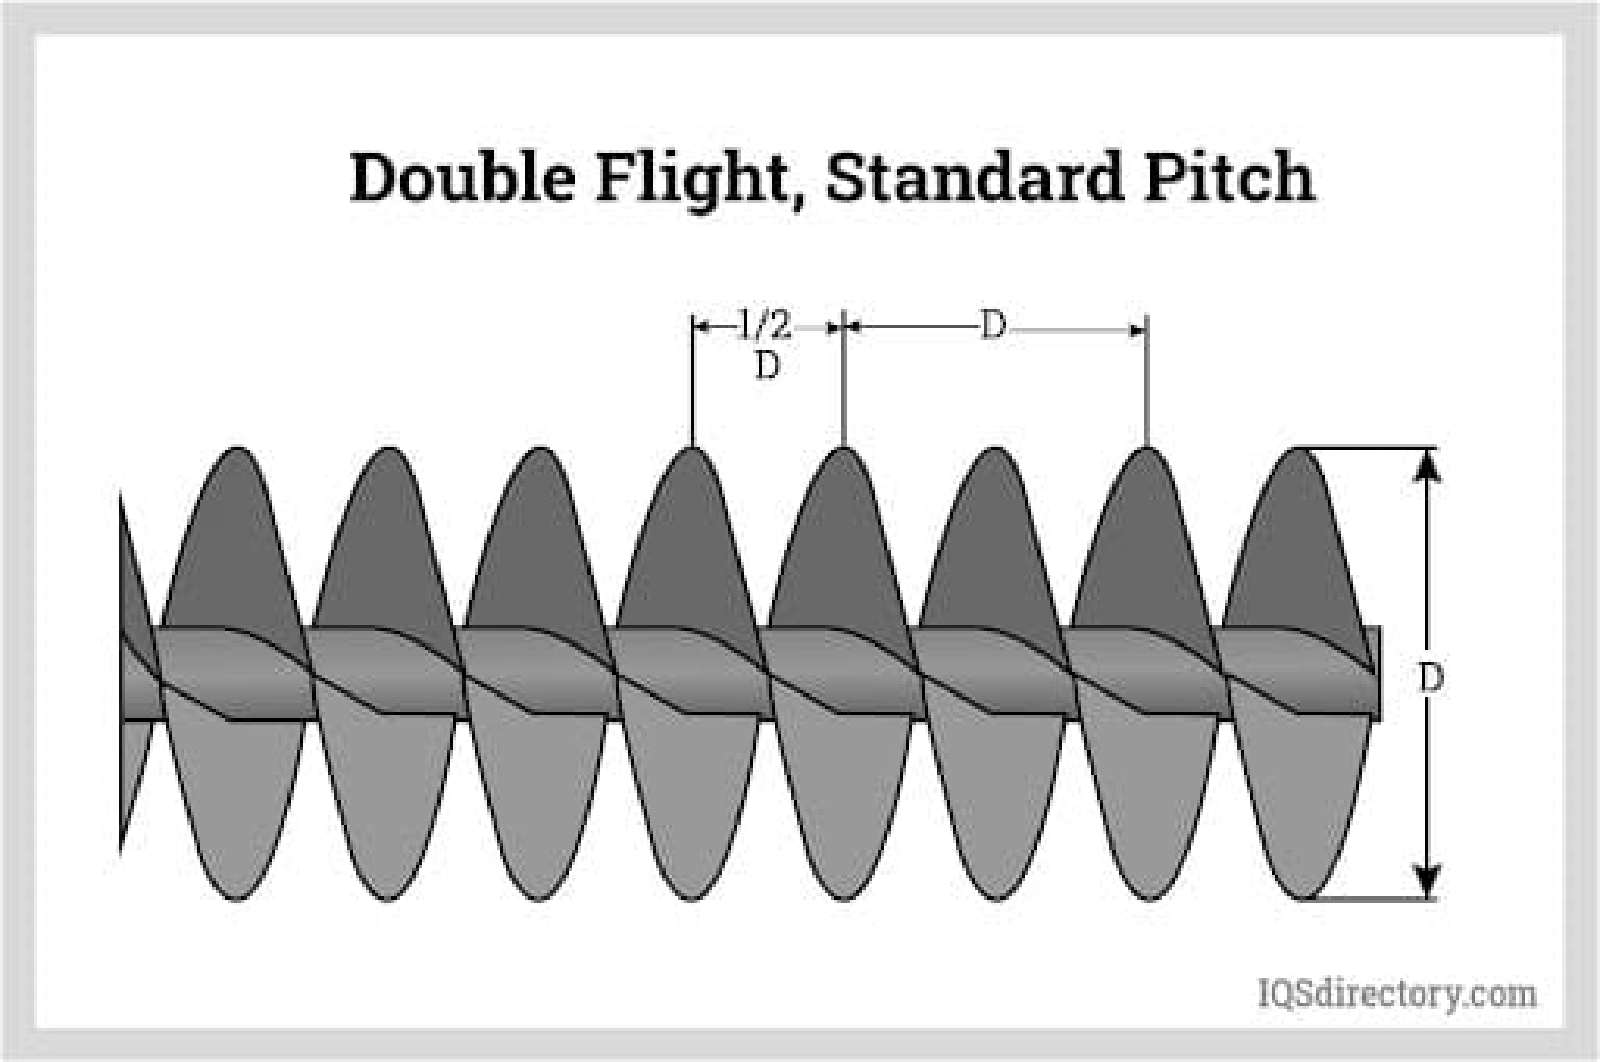 Double Flight, Standard Pitch